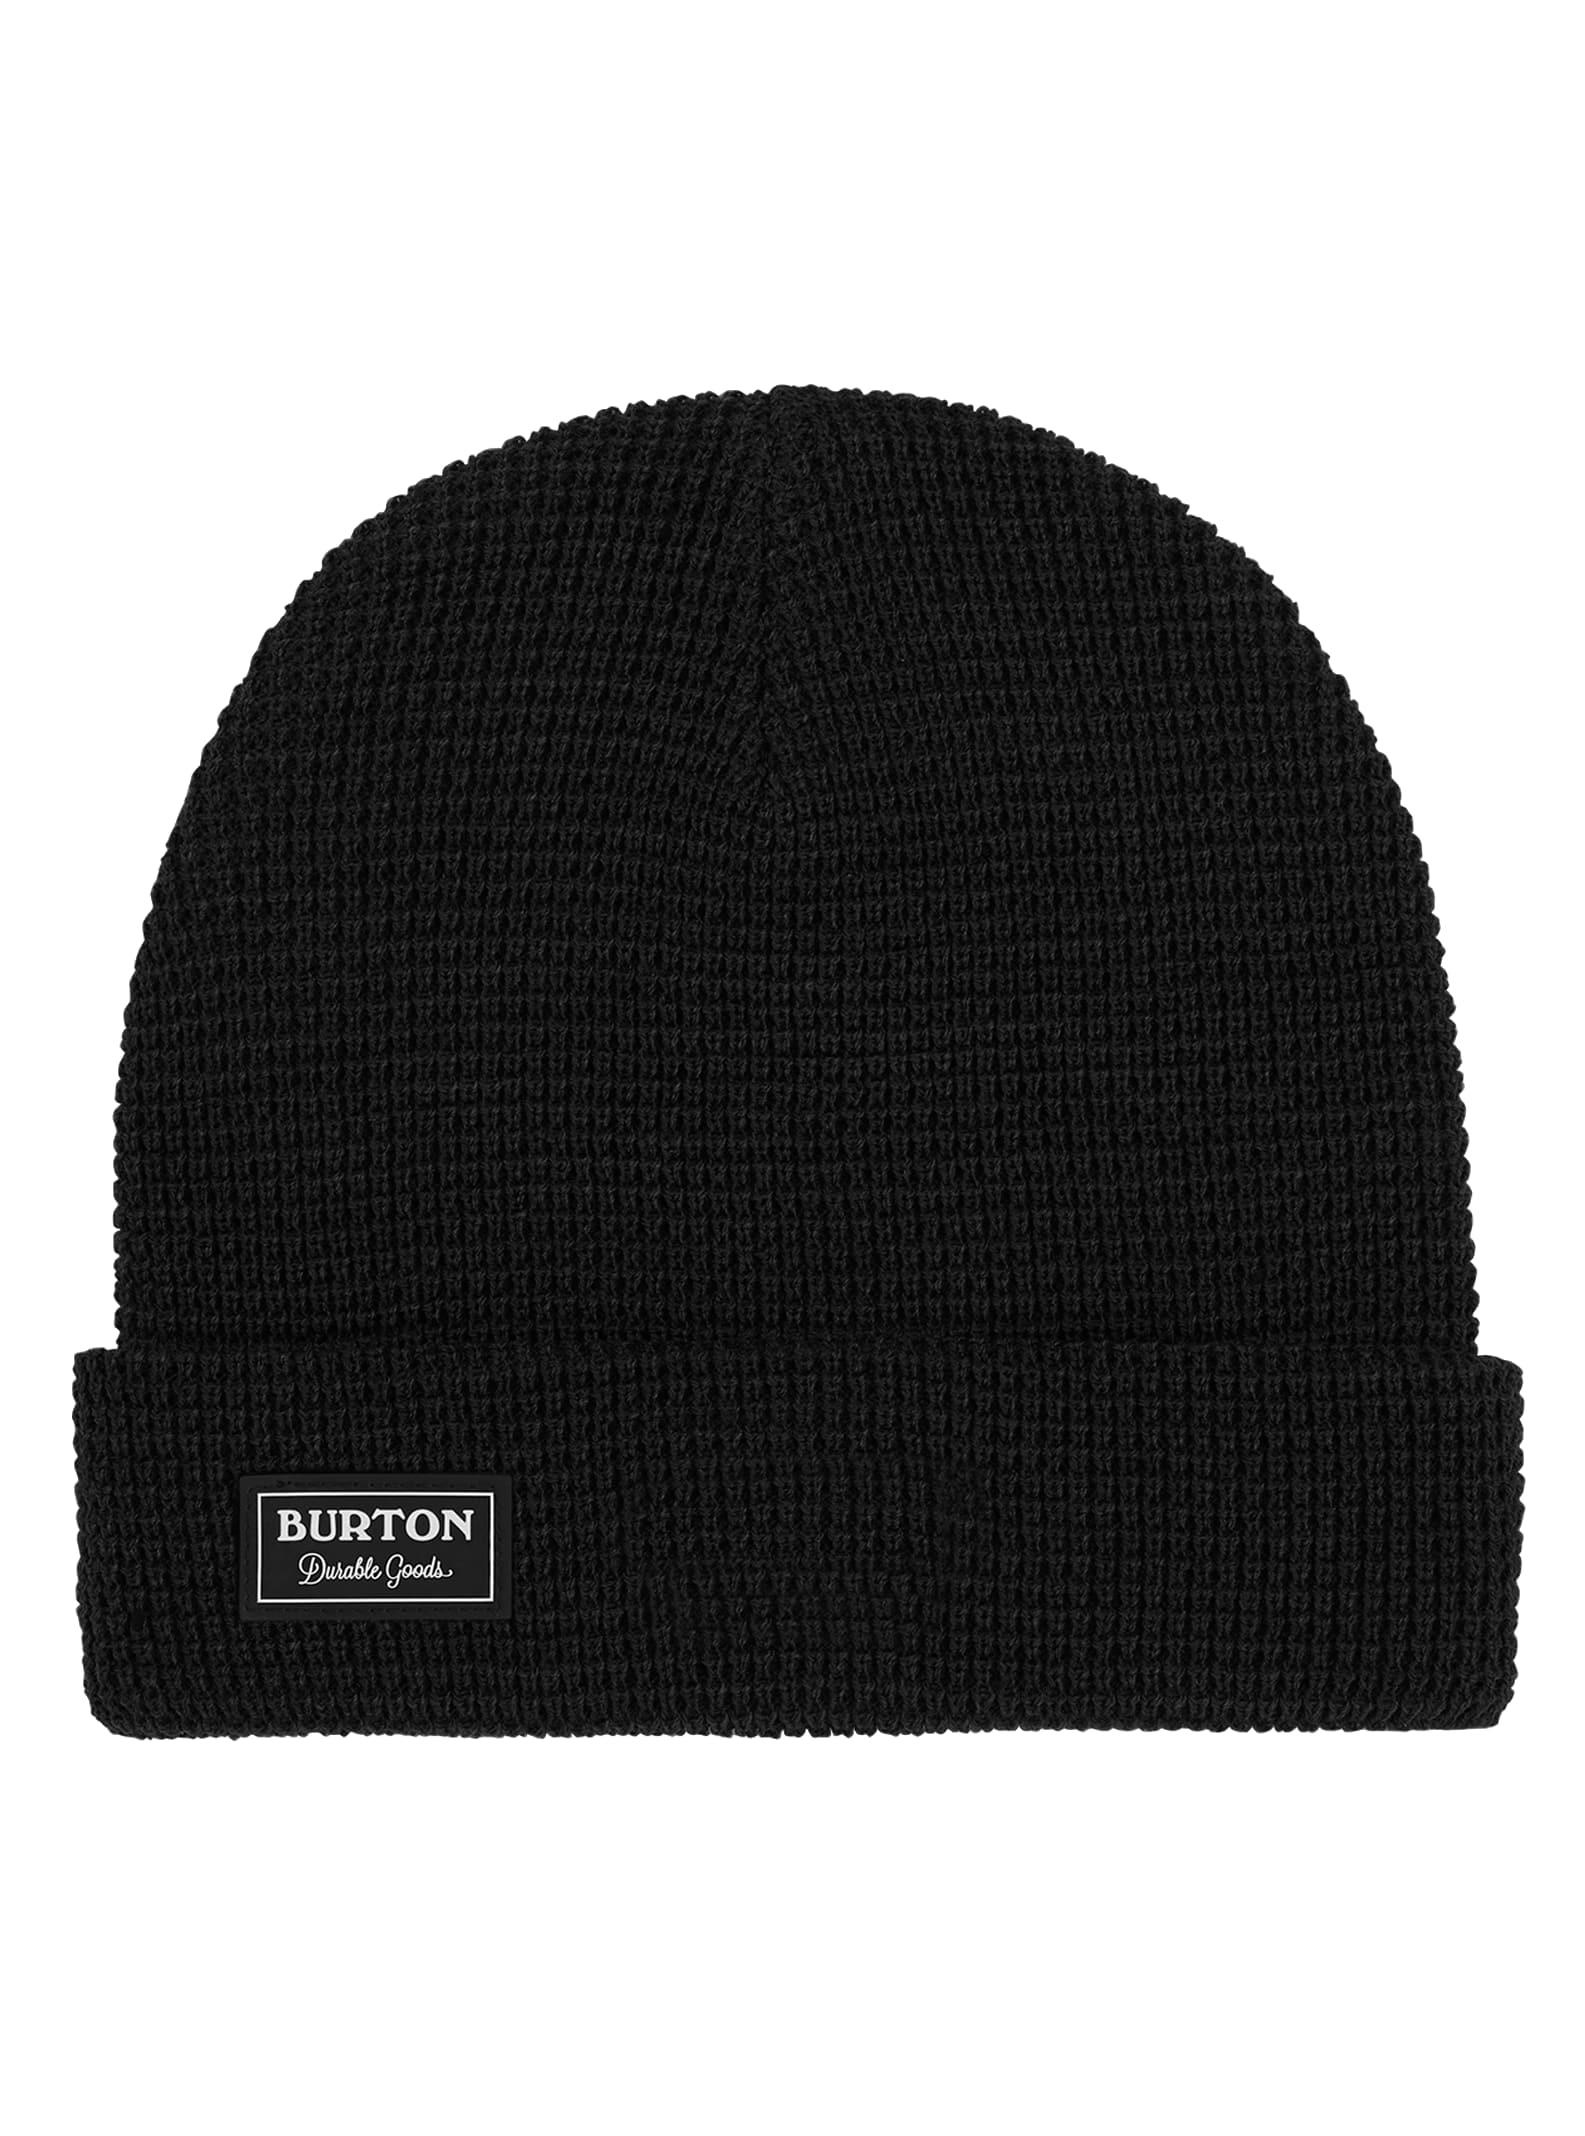 6bc817936 Women's Hats & Beanies | Burton Snowboards